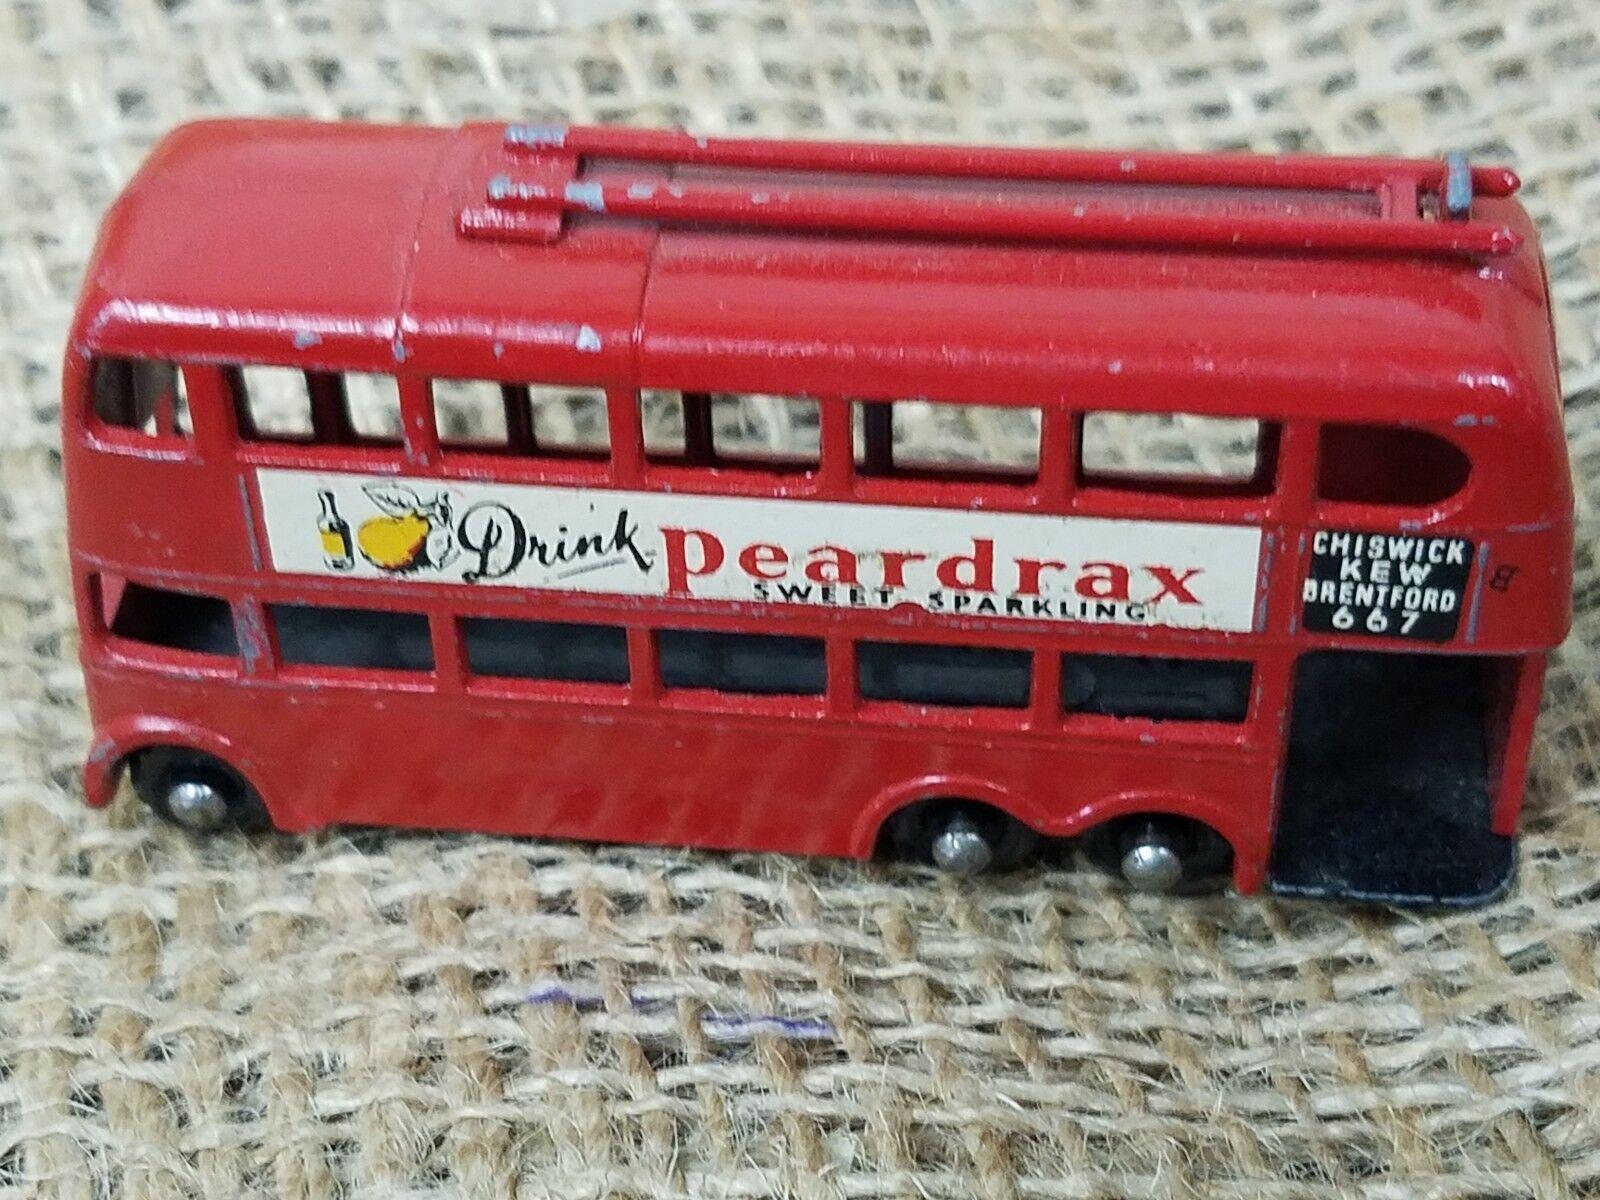 Vintage Lesney Matchbox  Peardrax London Trolley Bus -Excellent